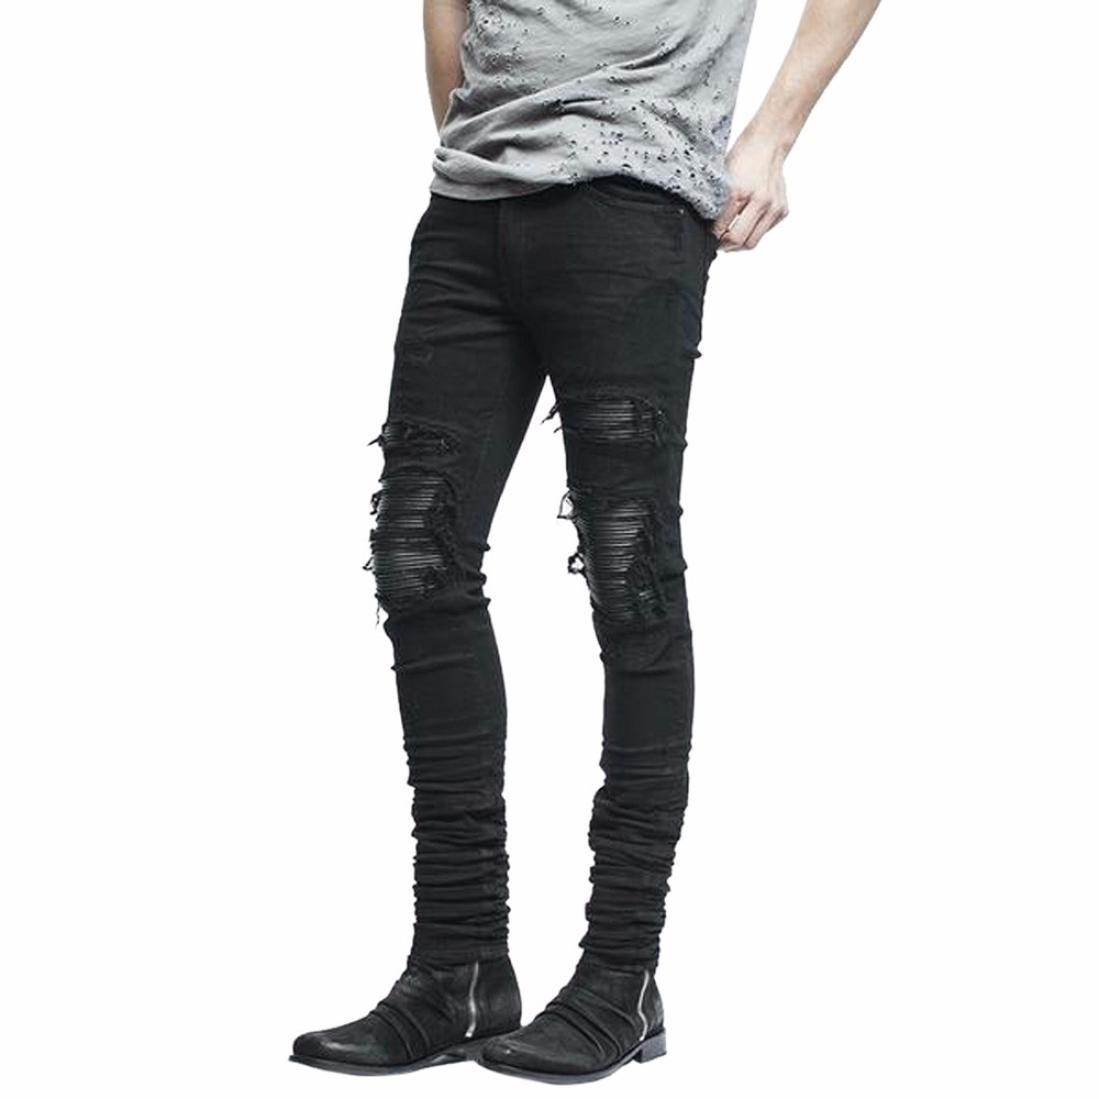 Men's Stretchy Ripped Skinny Biker Jeans Destroyed Taped Slim Fit Denim Pants (32, Black)